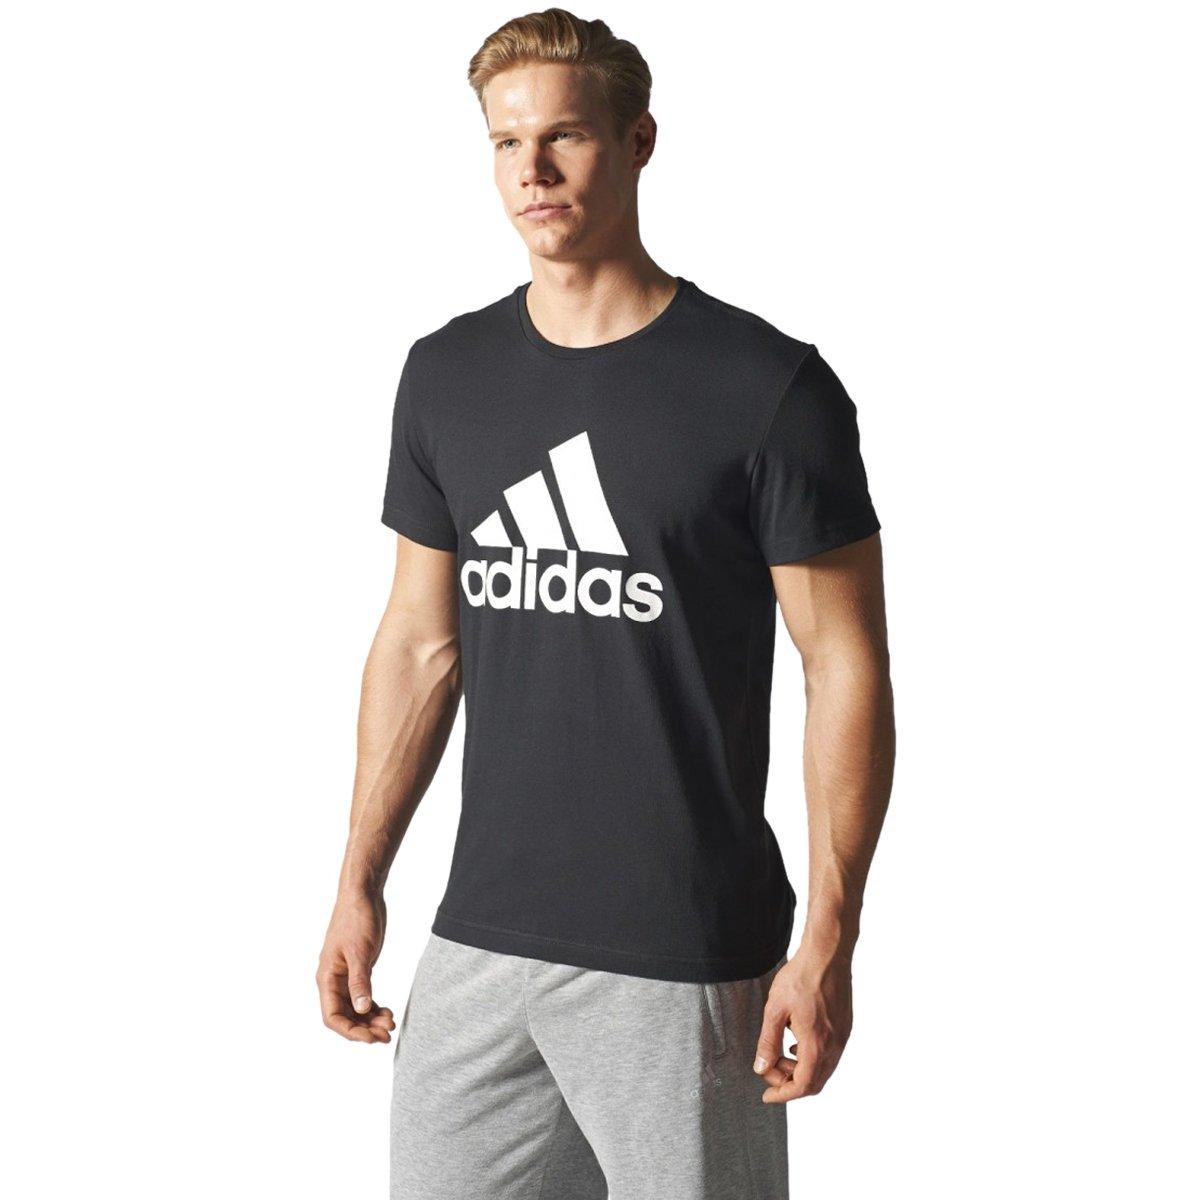 fc434e59bbe0b Bizz Store - Camiseta Masculina Adidas Tech Fit Logo Preta